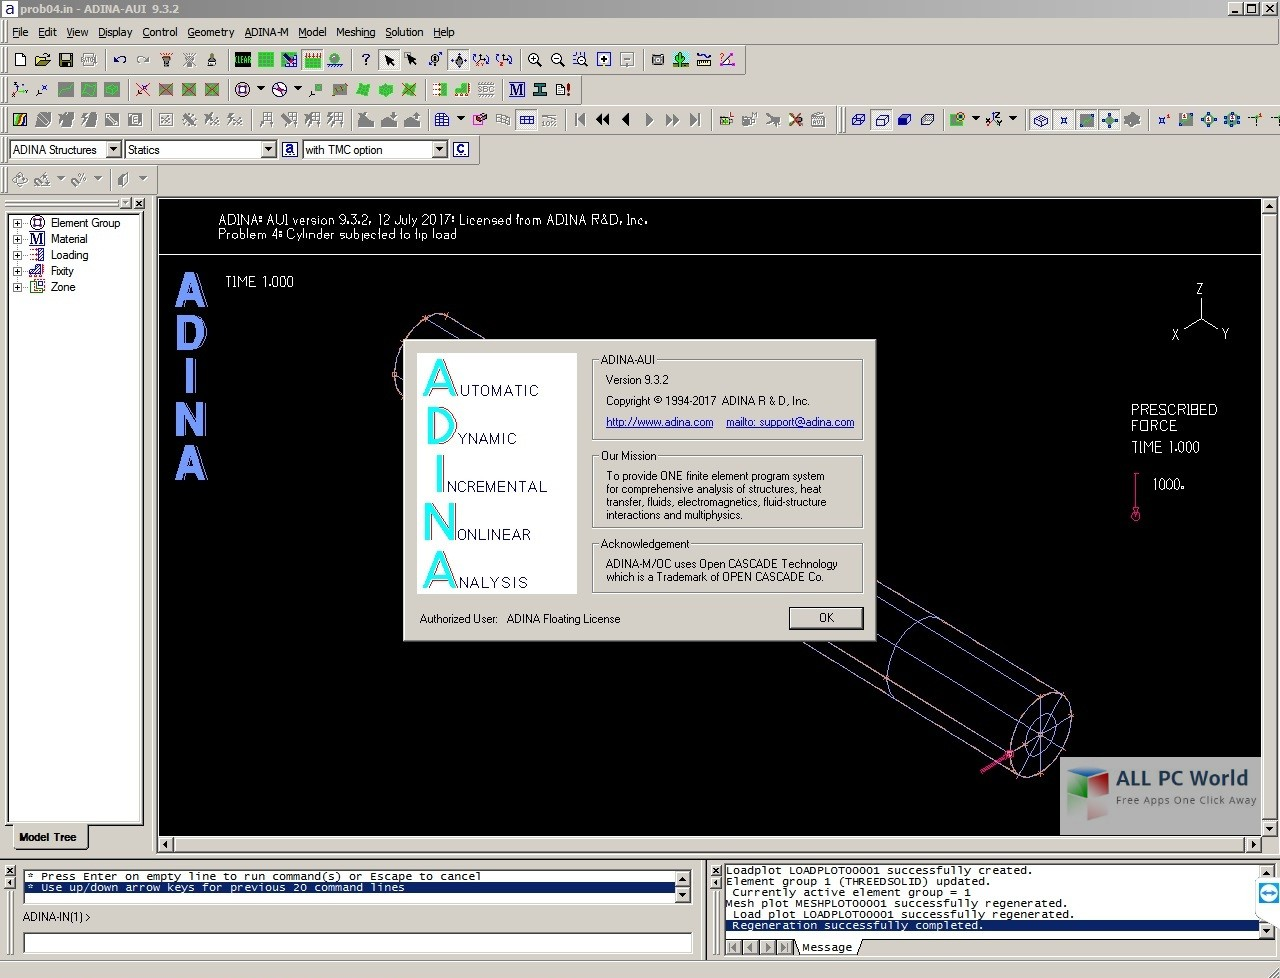 ADINA System 9.3.2 Review